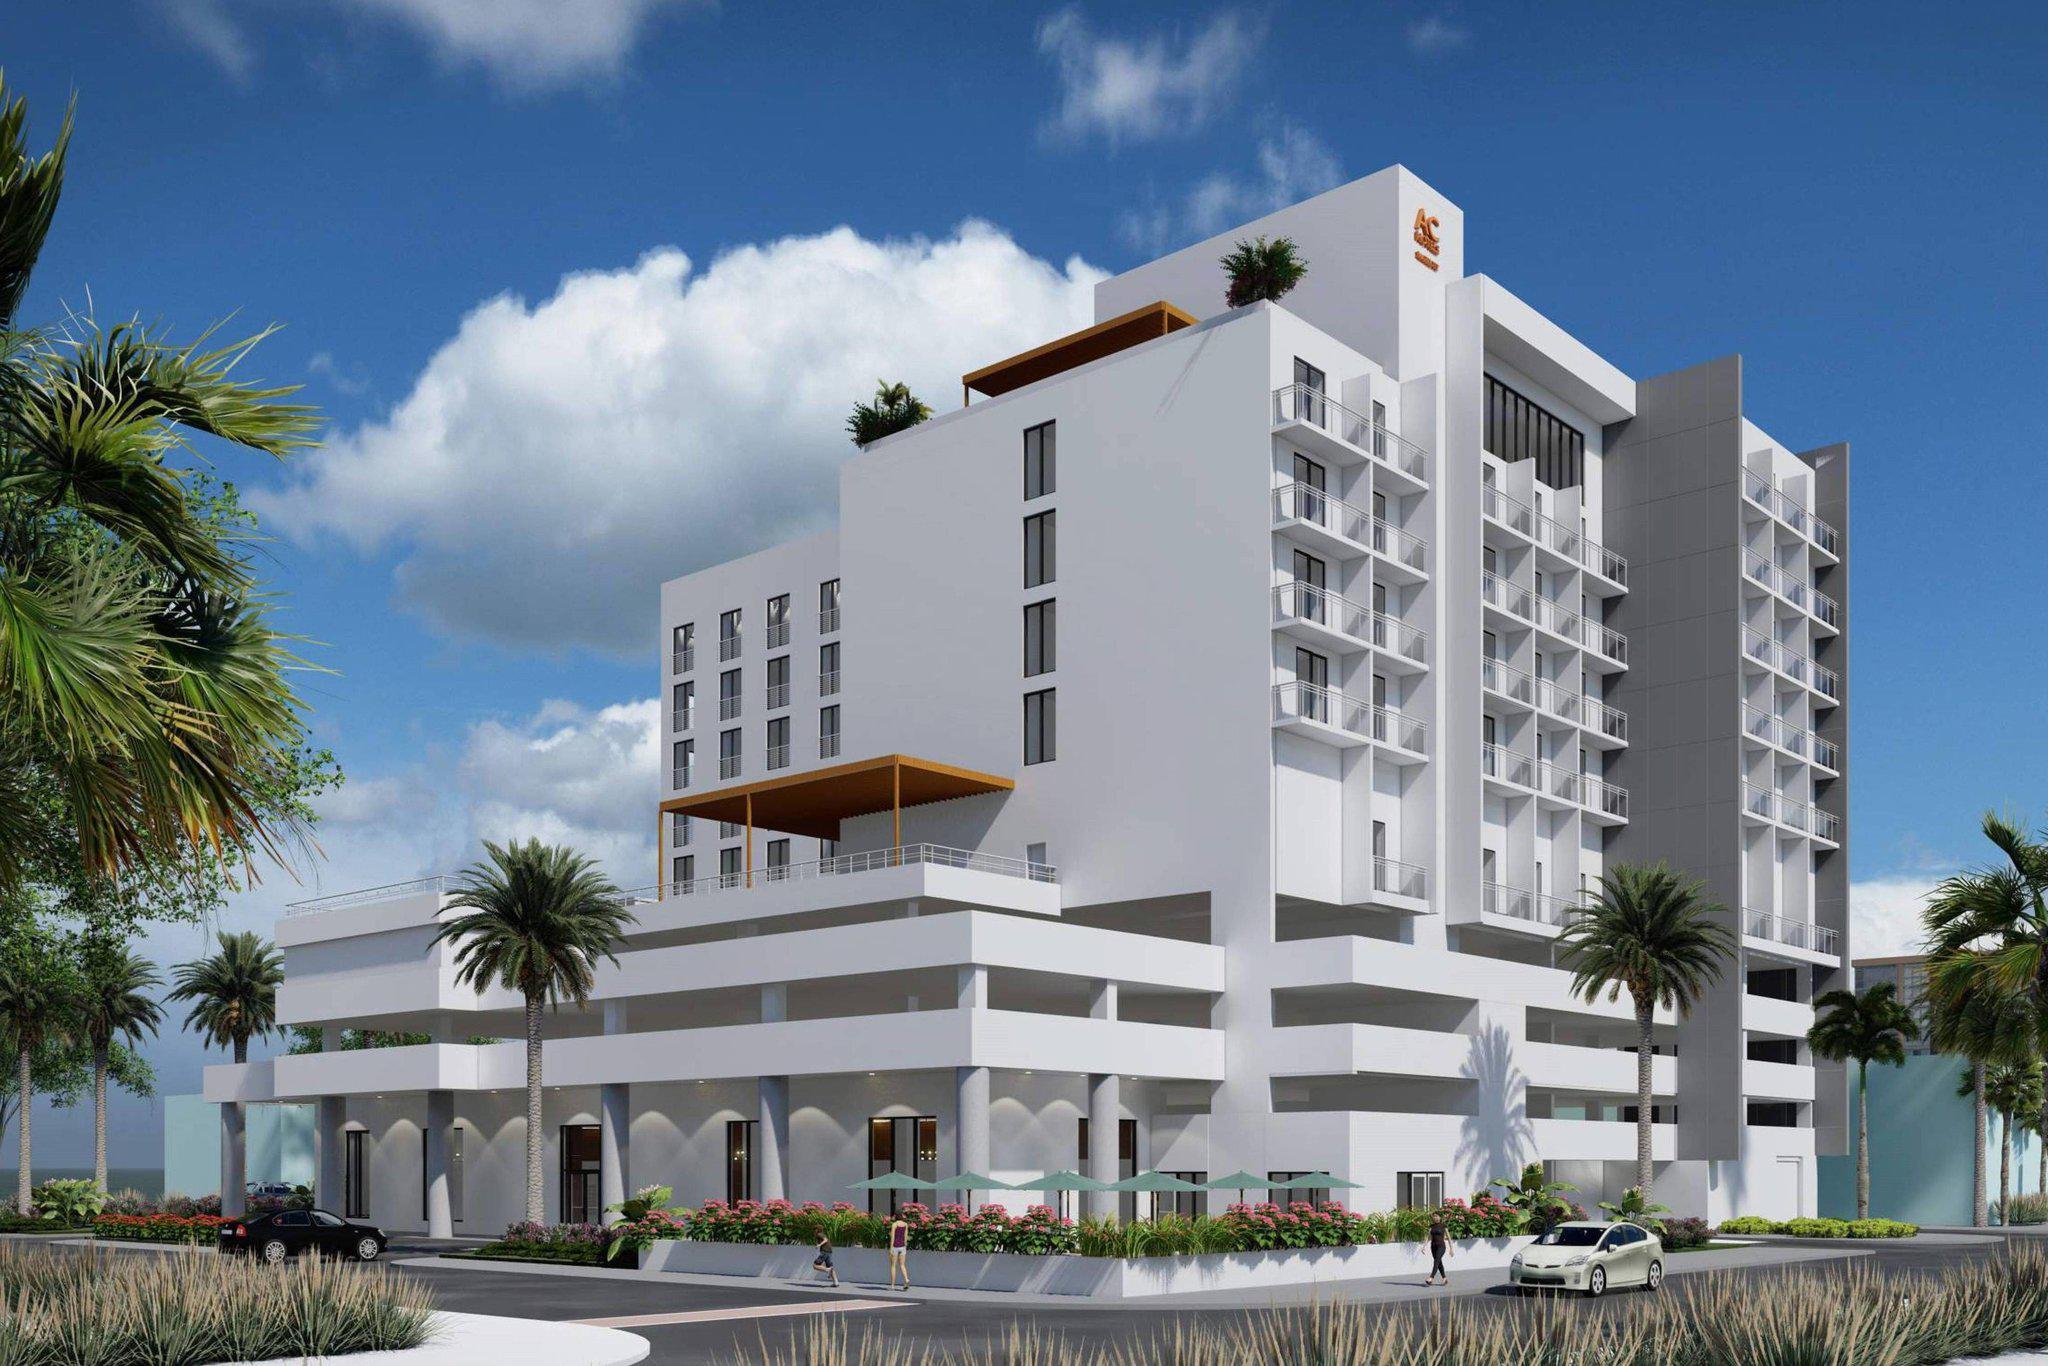 AC Hotel by Marriott Clearwater Beach